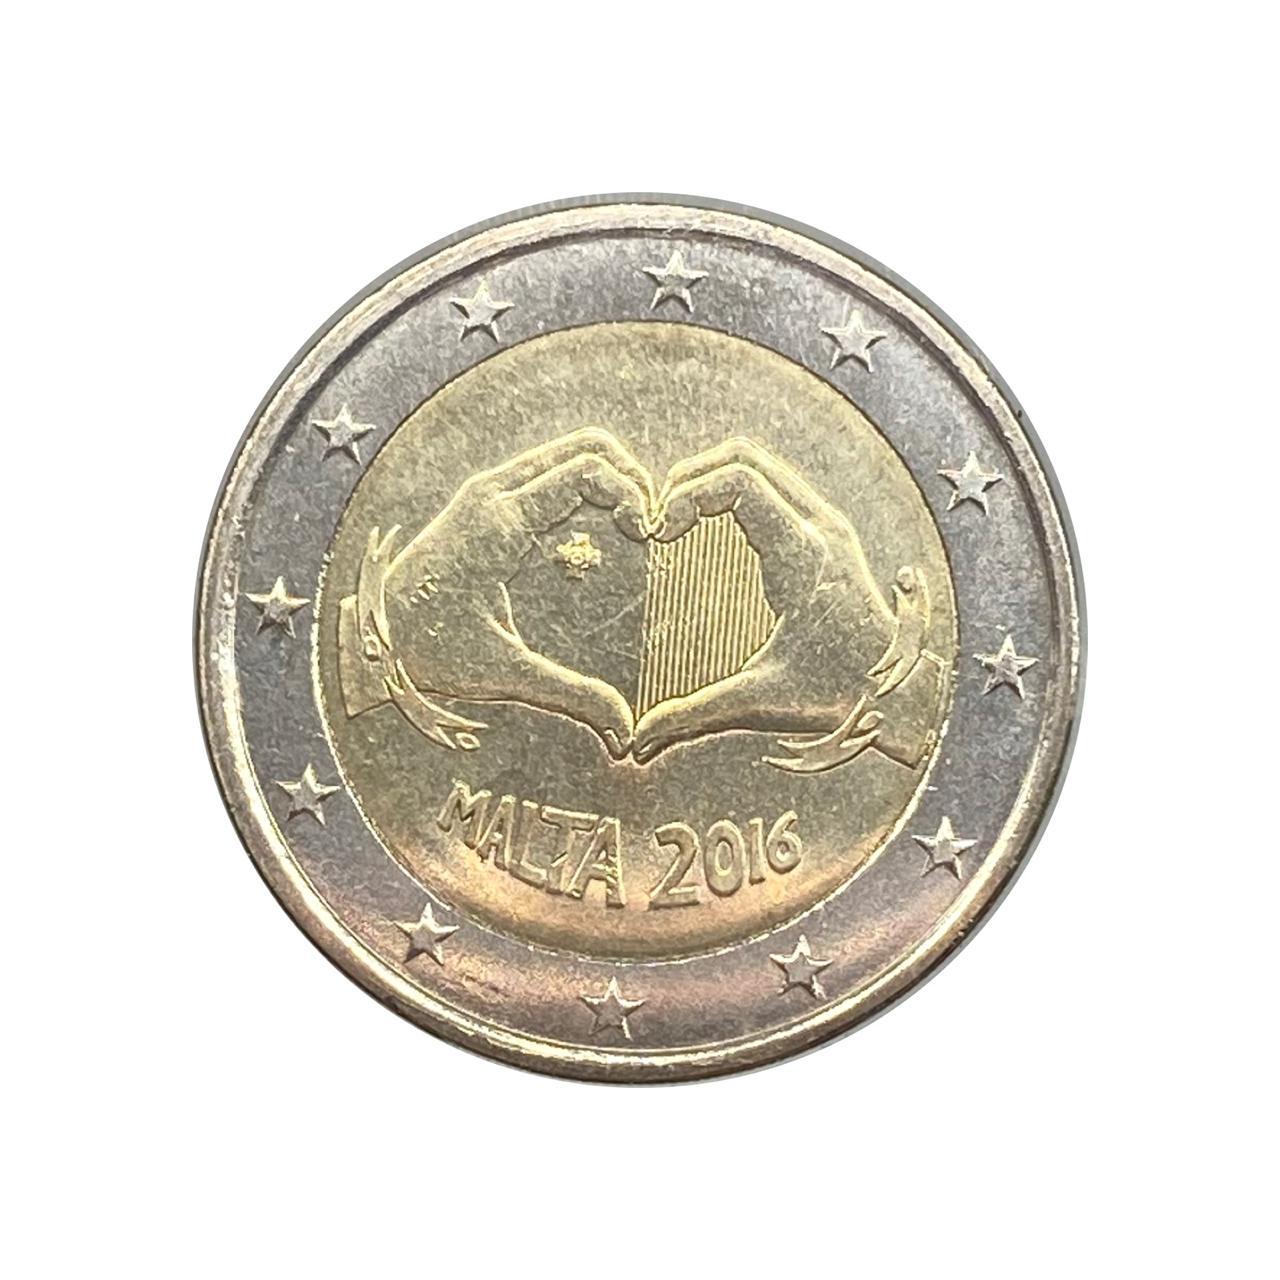 2 Euros Malta 2016 FC